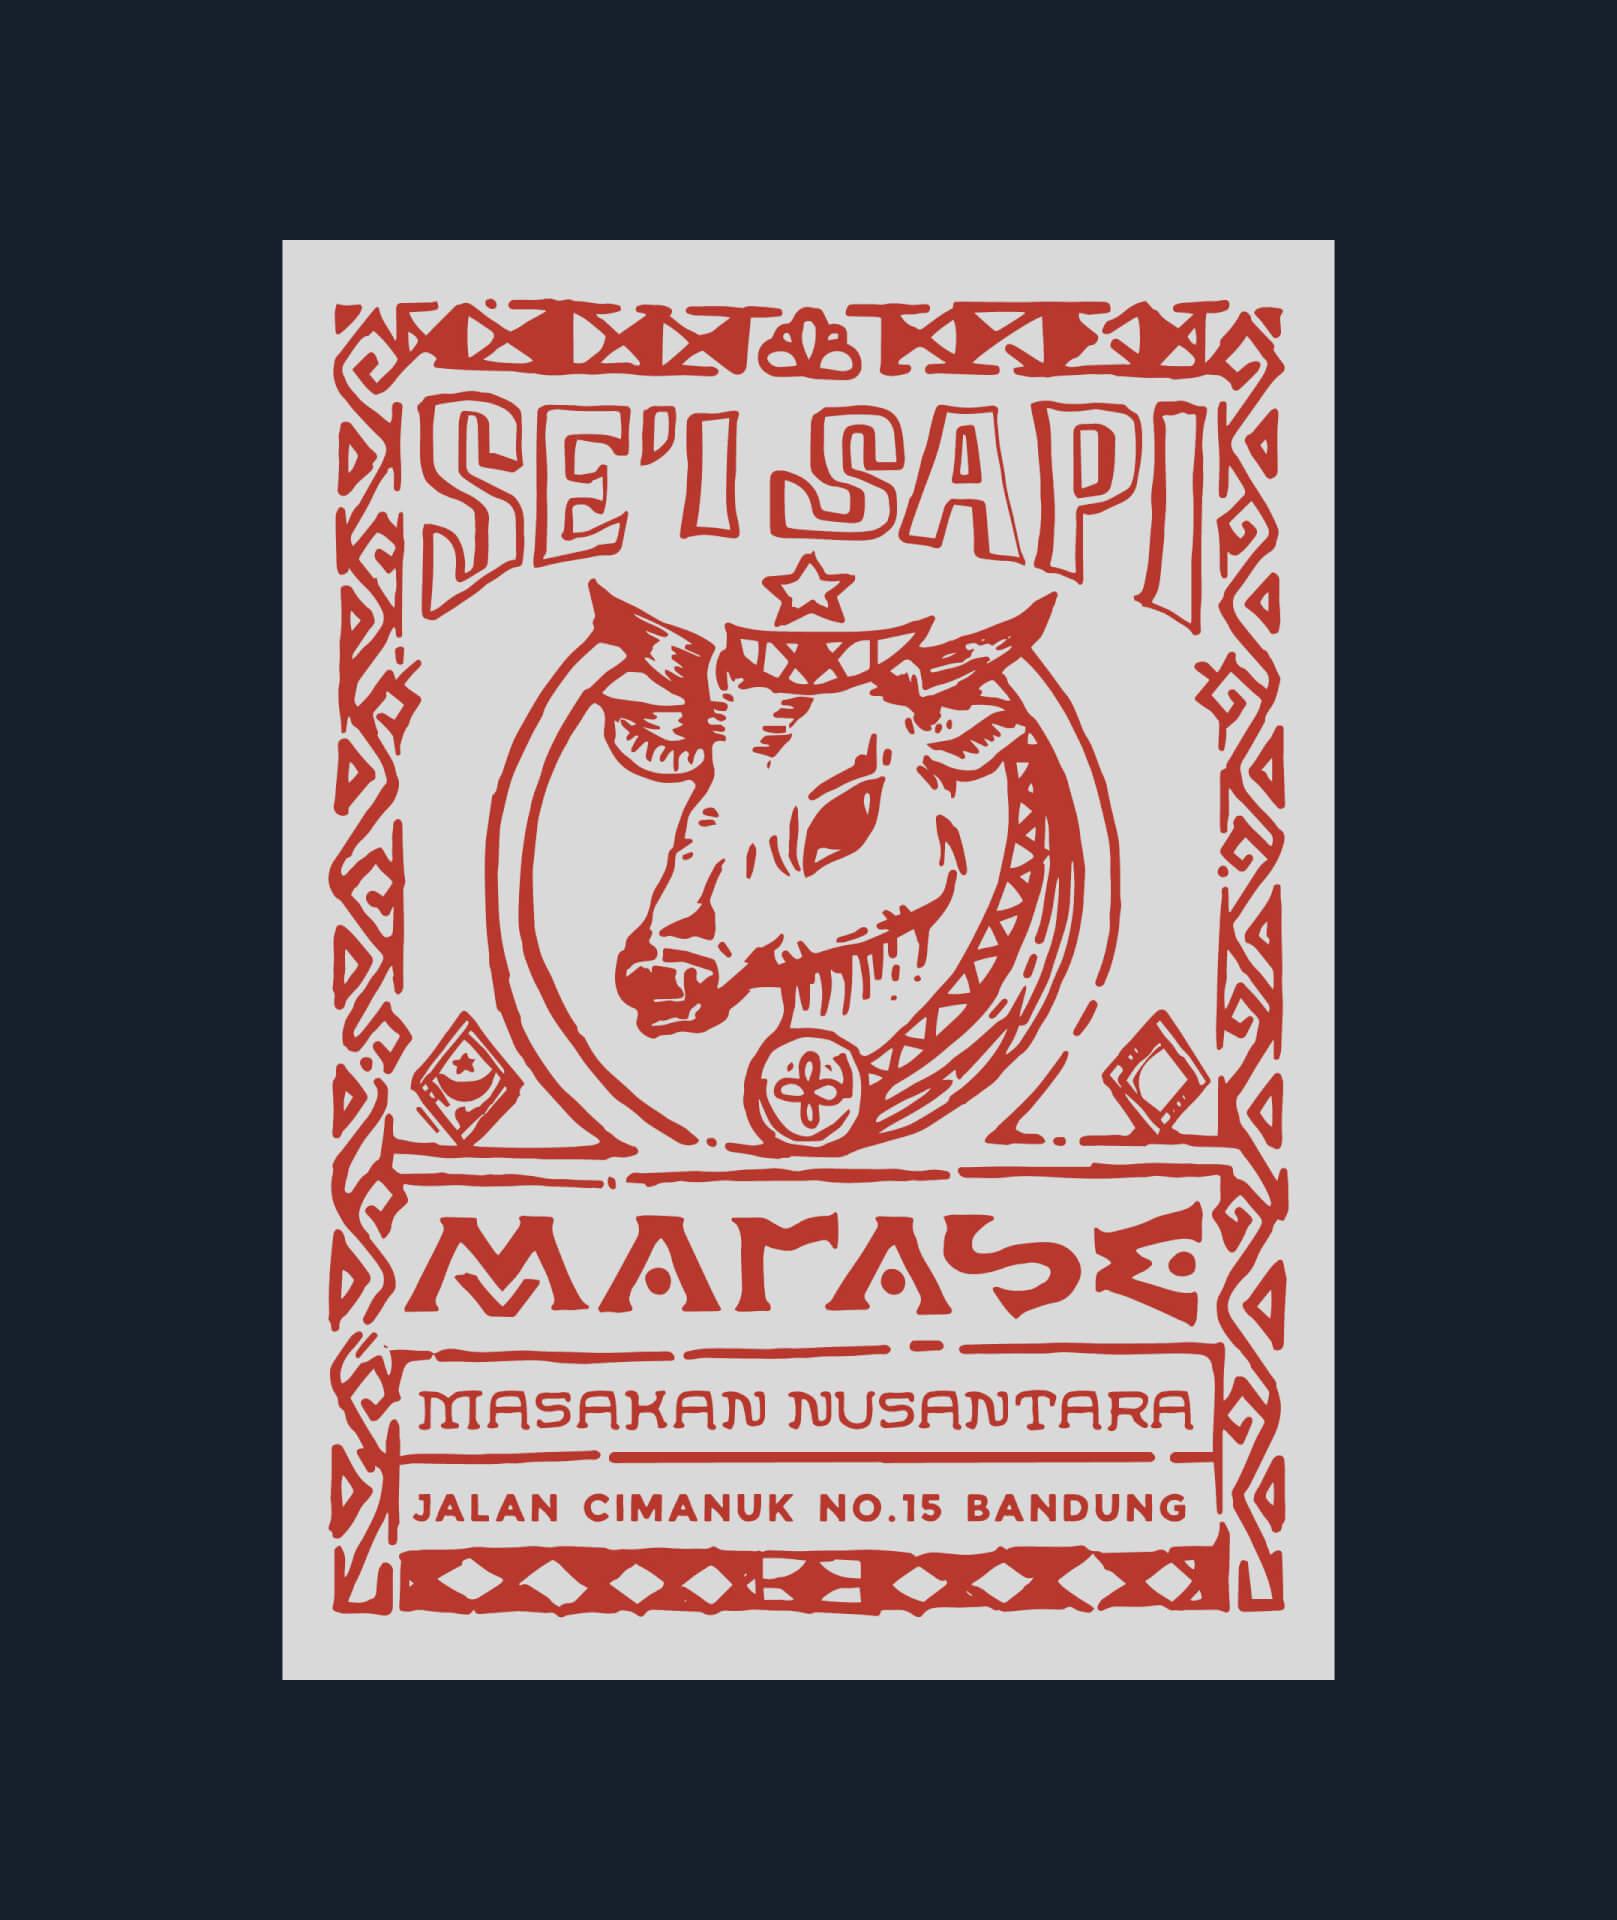 AGNI_MaraseGraphic_graphicassets02